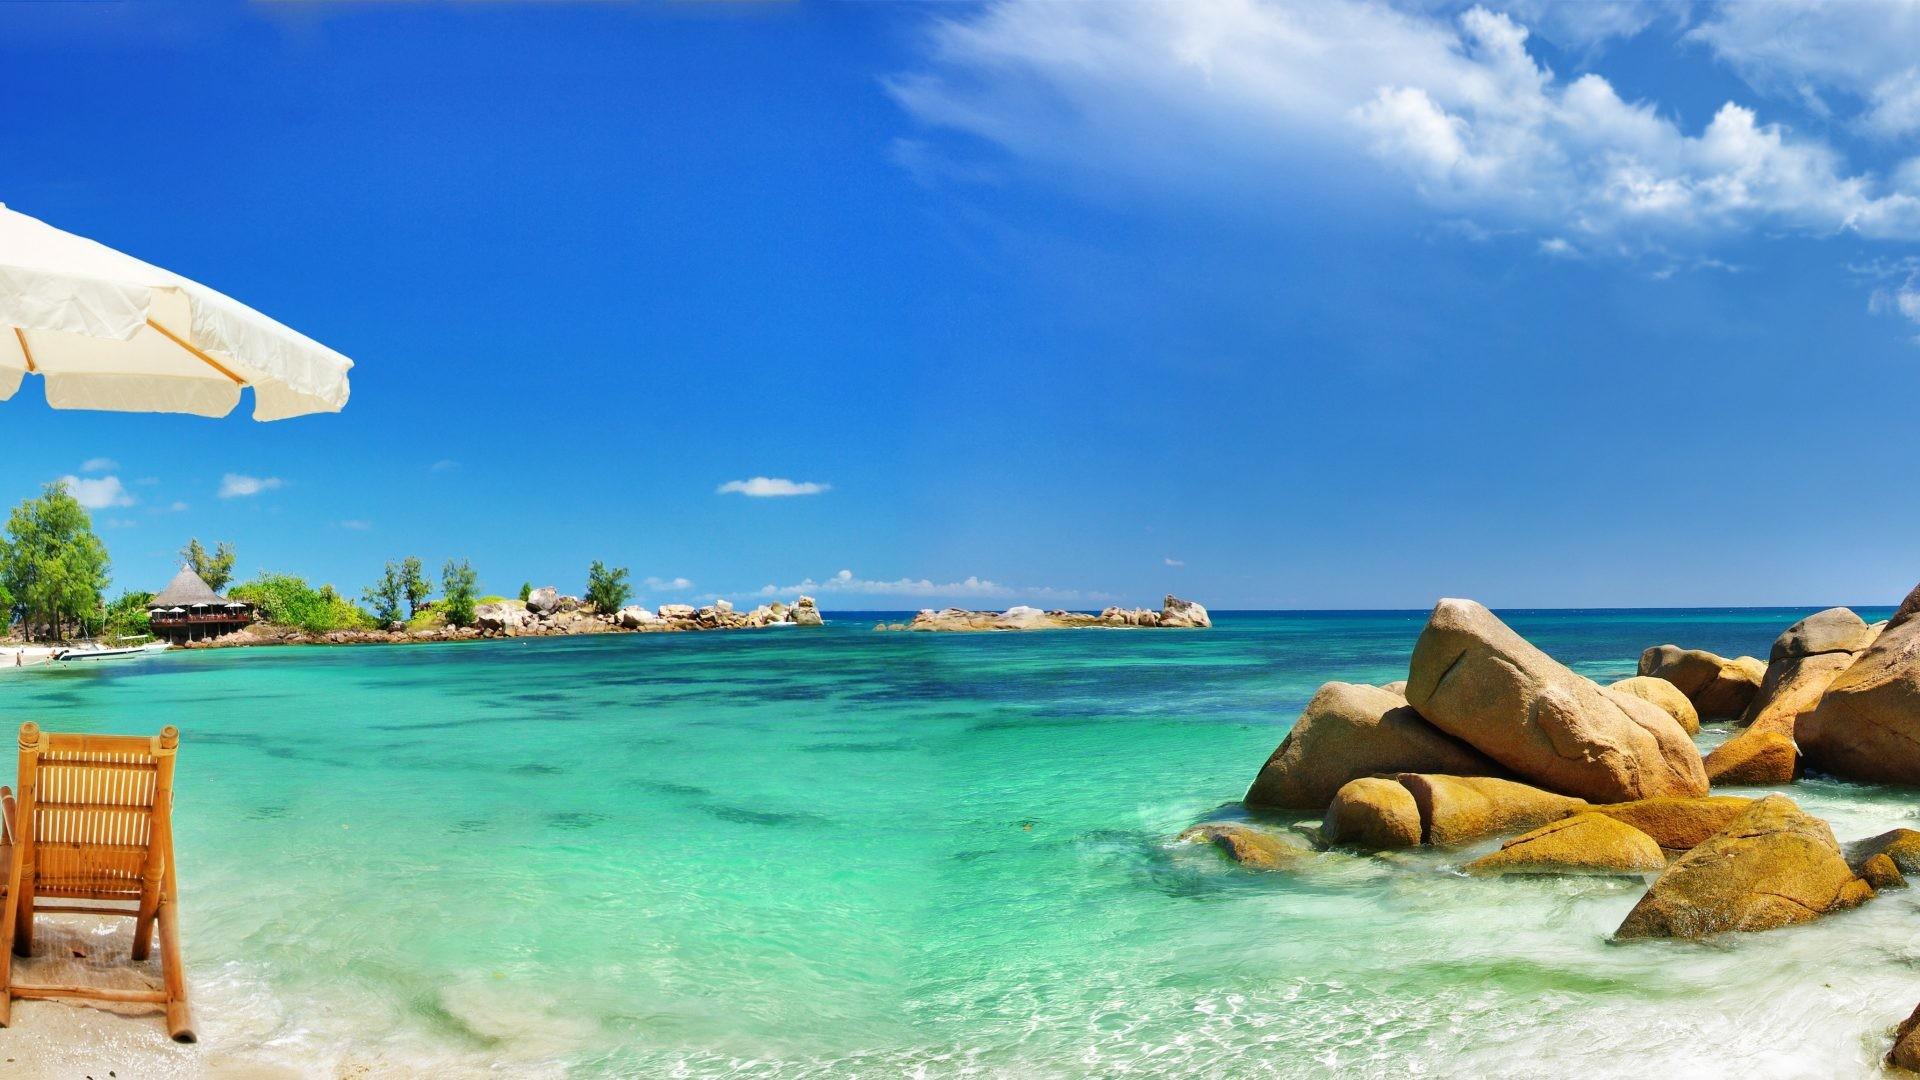 Ocean View Wallpapers Images Beach